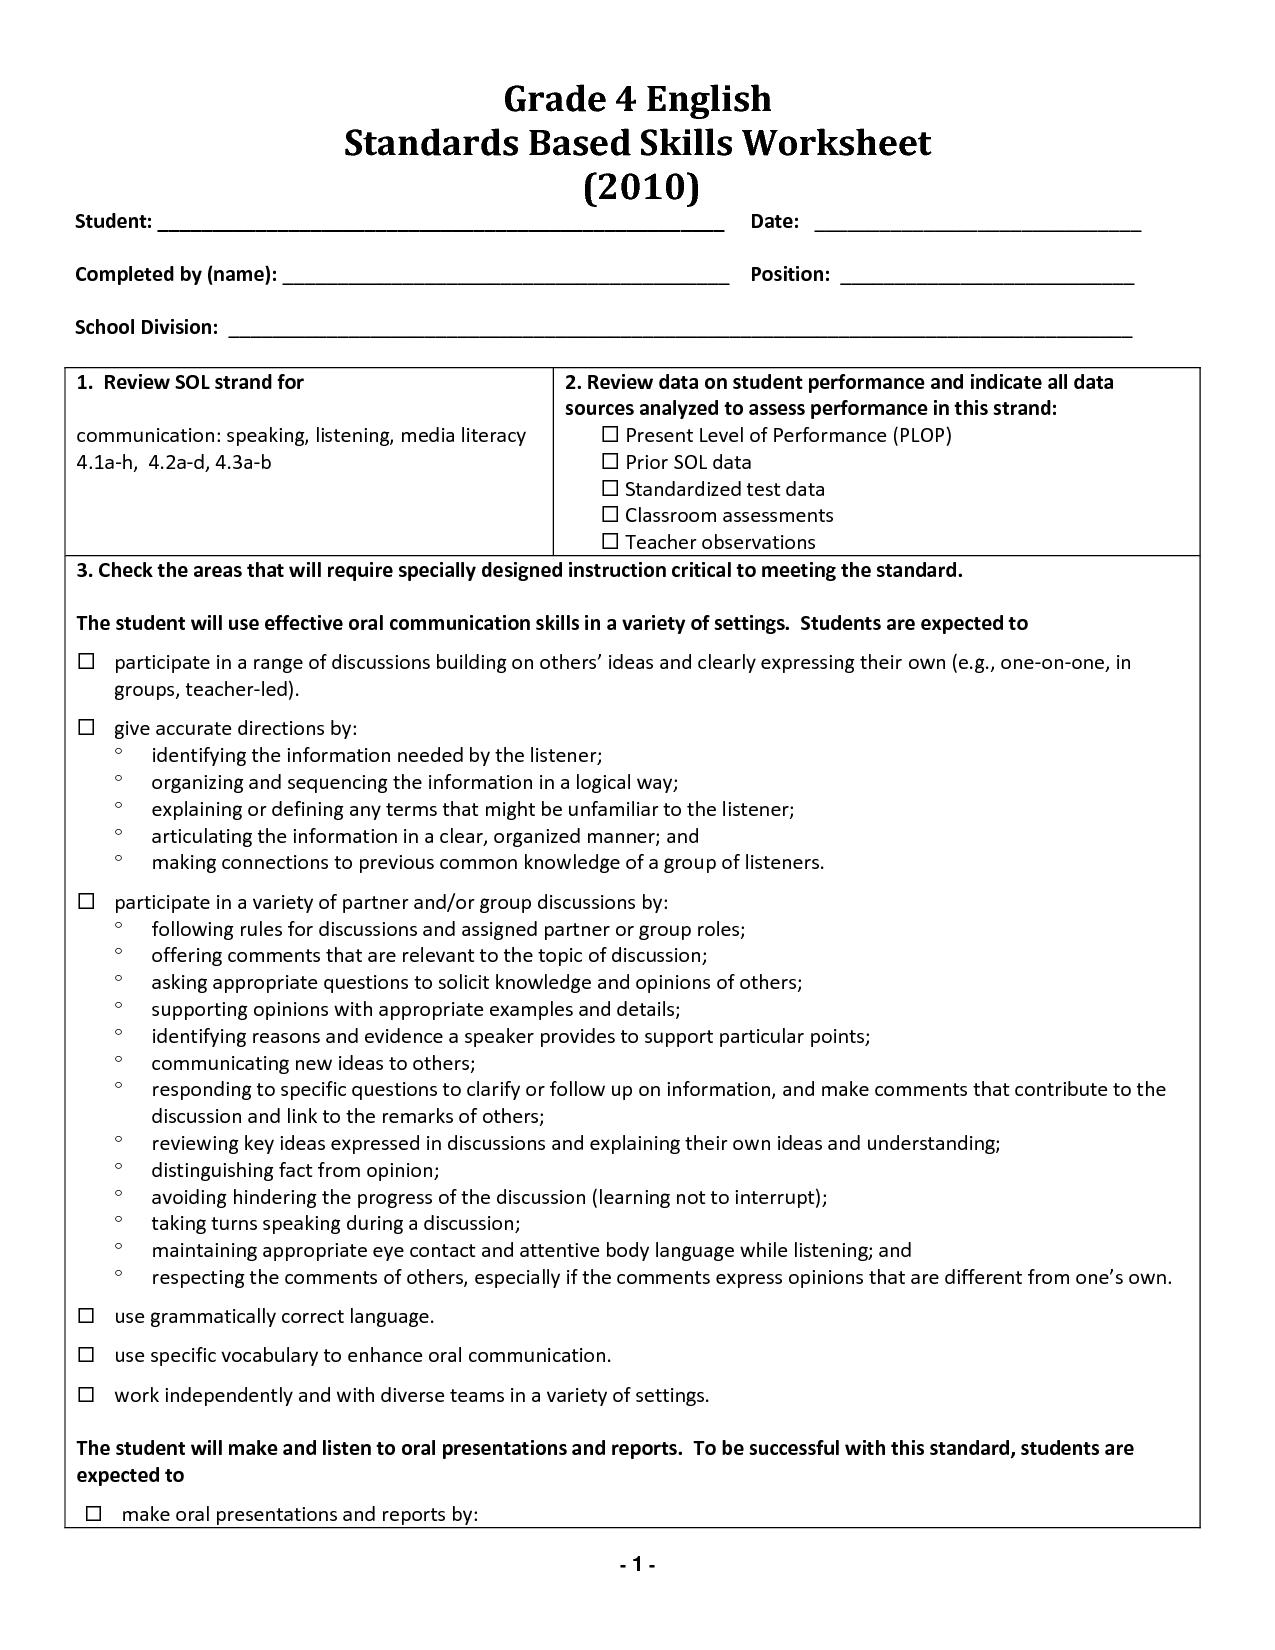 Grade 4 Free Printable Worksheets